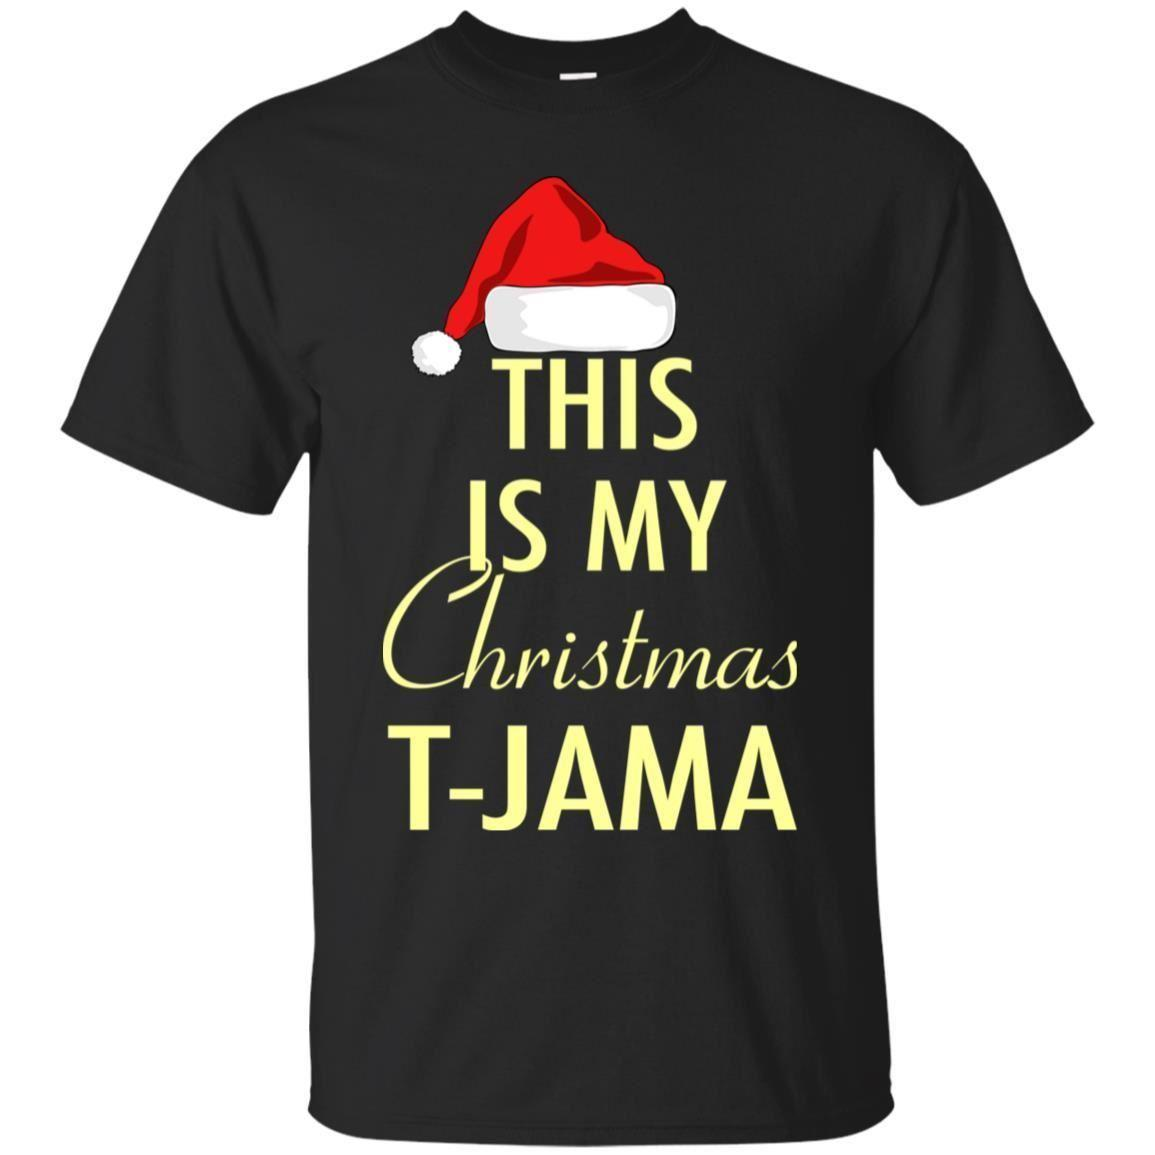 5c4547eb Matching Family Christmas Shirt Xmas Funny Holidays Gift Black, Navy T Shirt  G20 Funny Unisex Tshirt Top Fun T Shirts Online Shirts From Handdrawntees,  ...